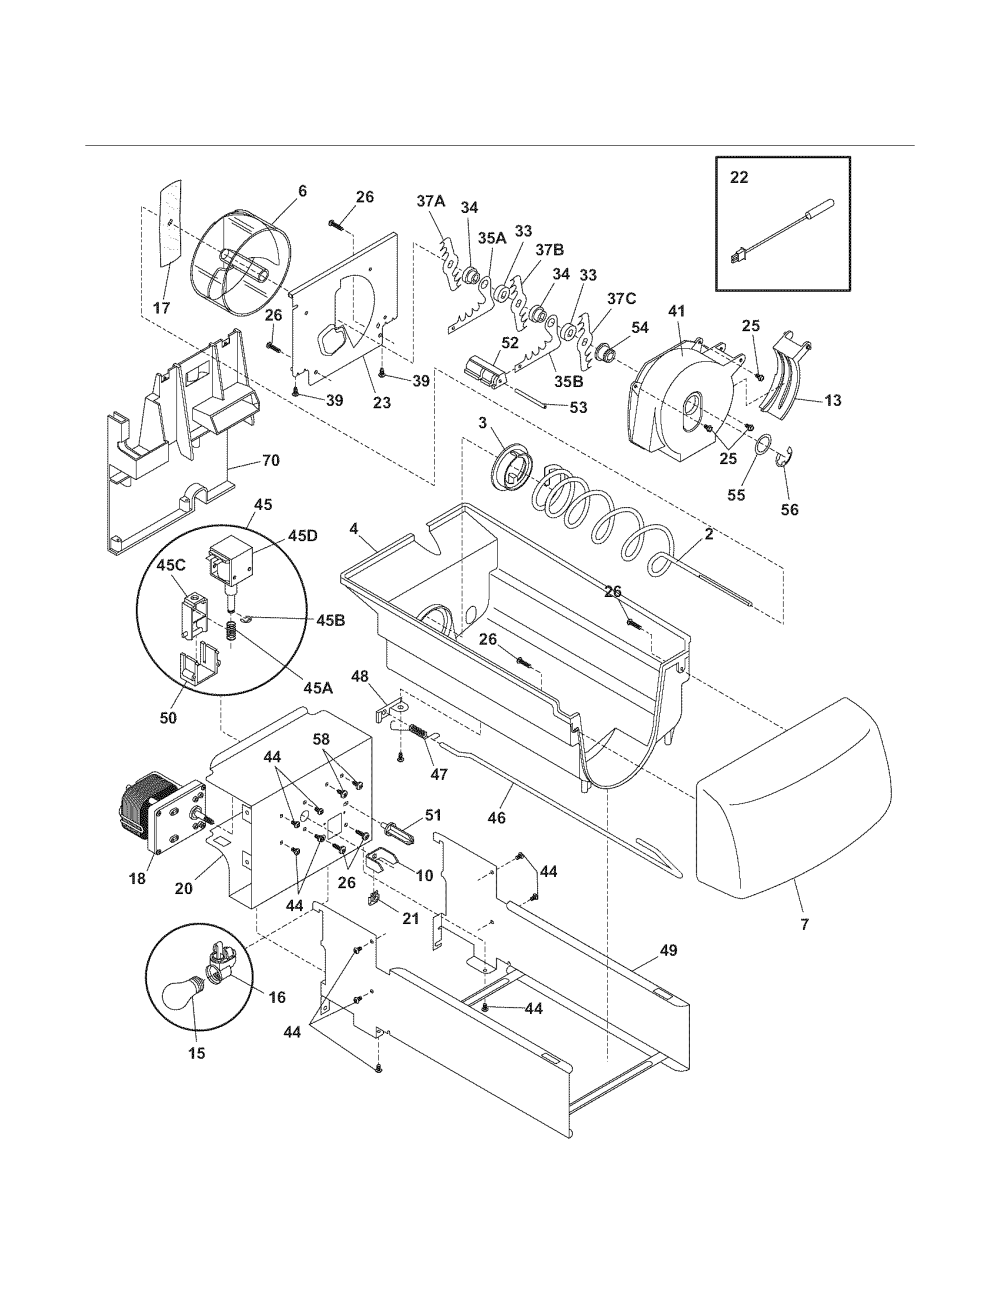 medium resolution of kenmore elite 110 wiring diagram kenmore elite he3 wiring diagram kenmore elite dryer wiring kenmore elite